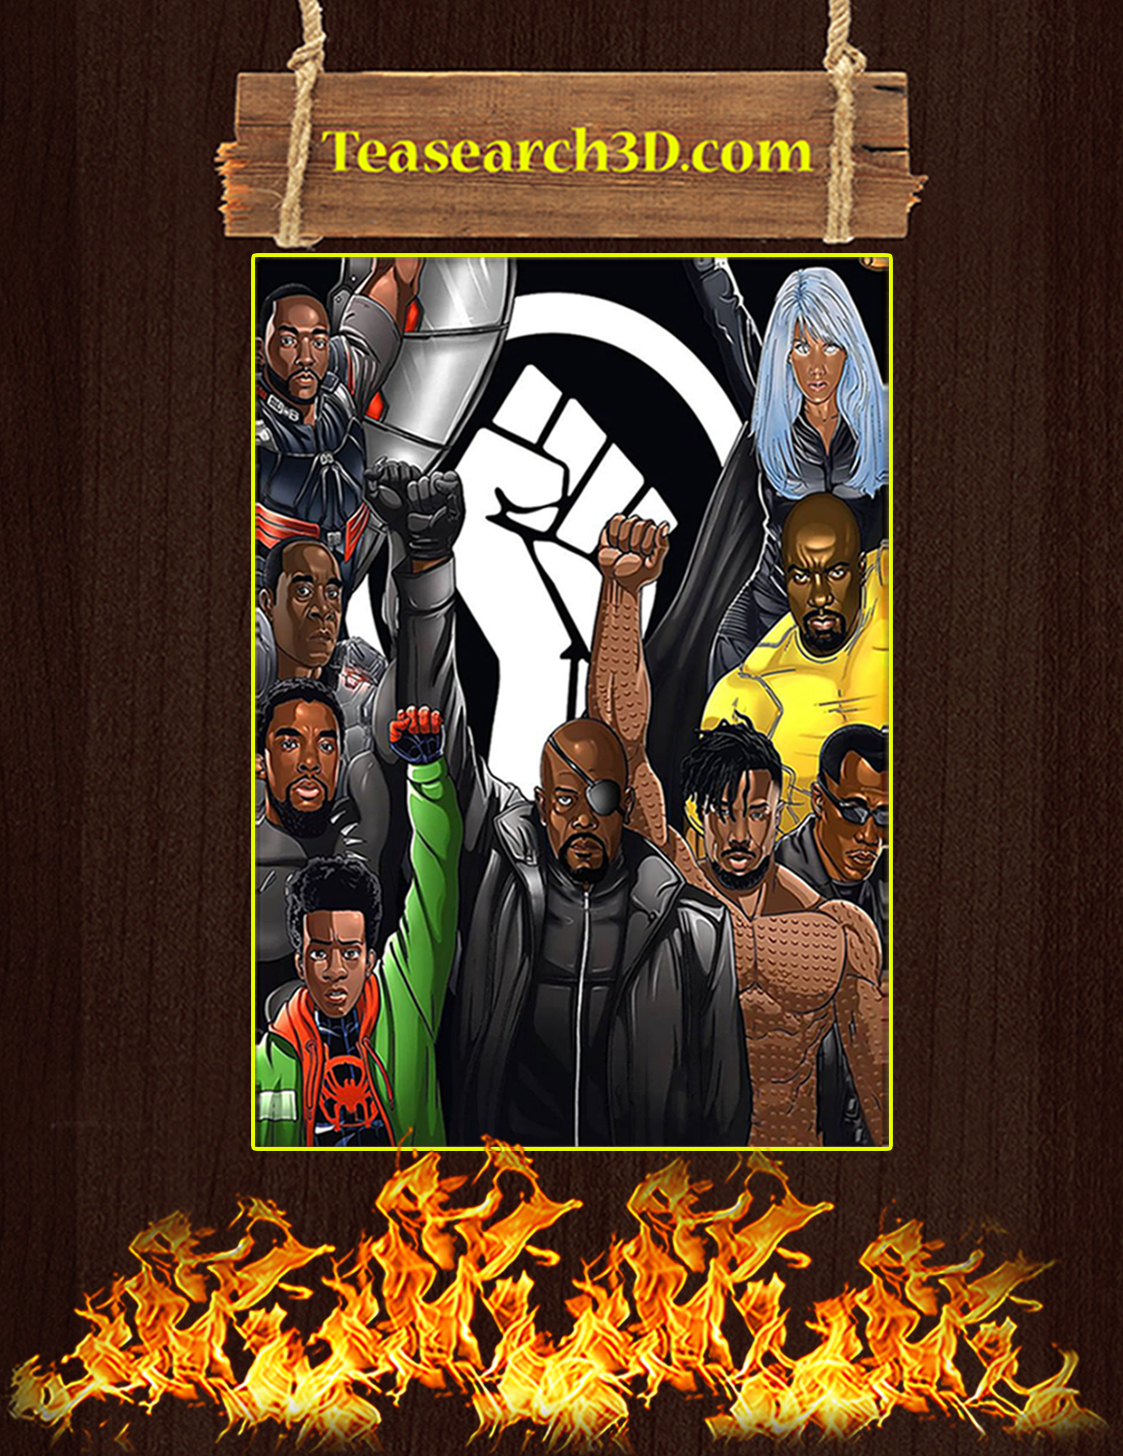 Raised fist black superheroes nick fury miles morales black panther erik killmonger poster A3